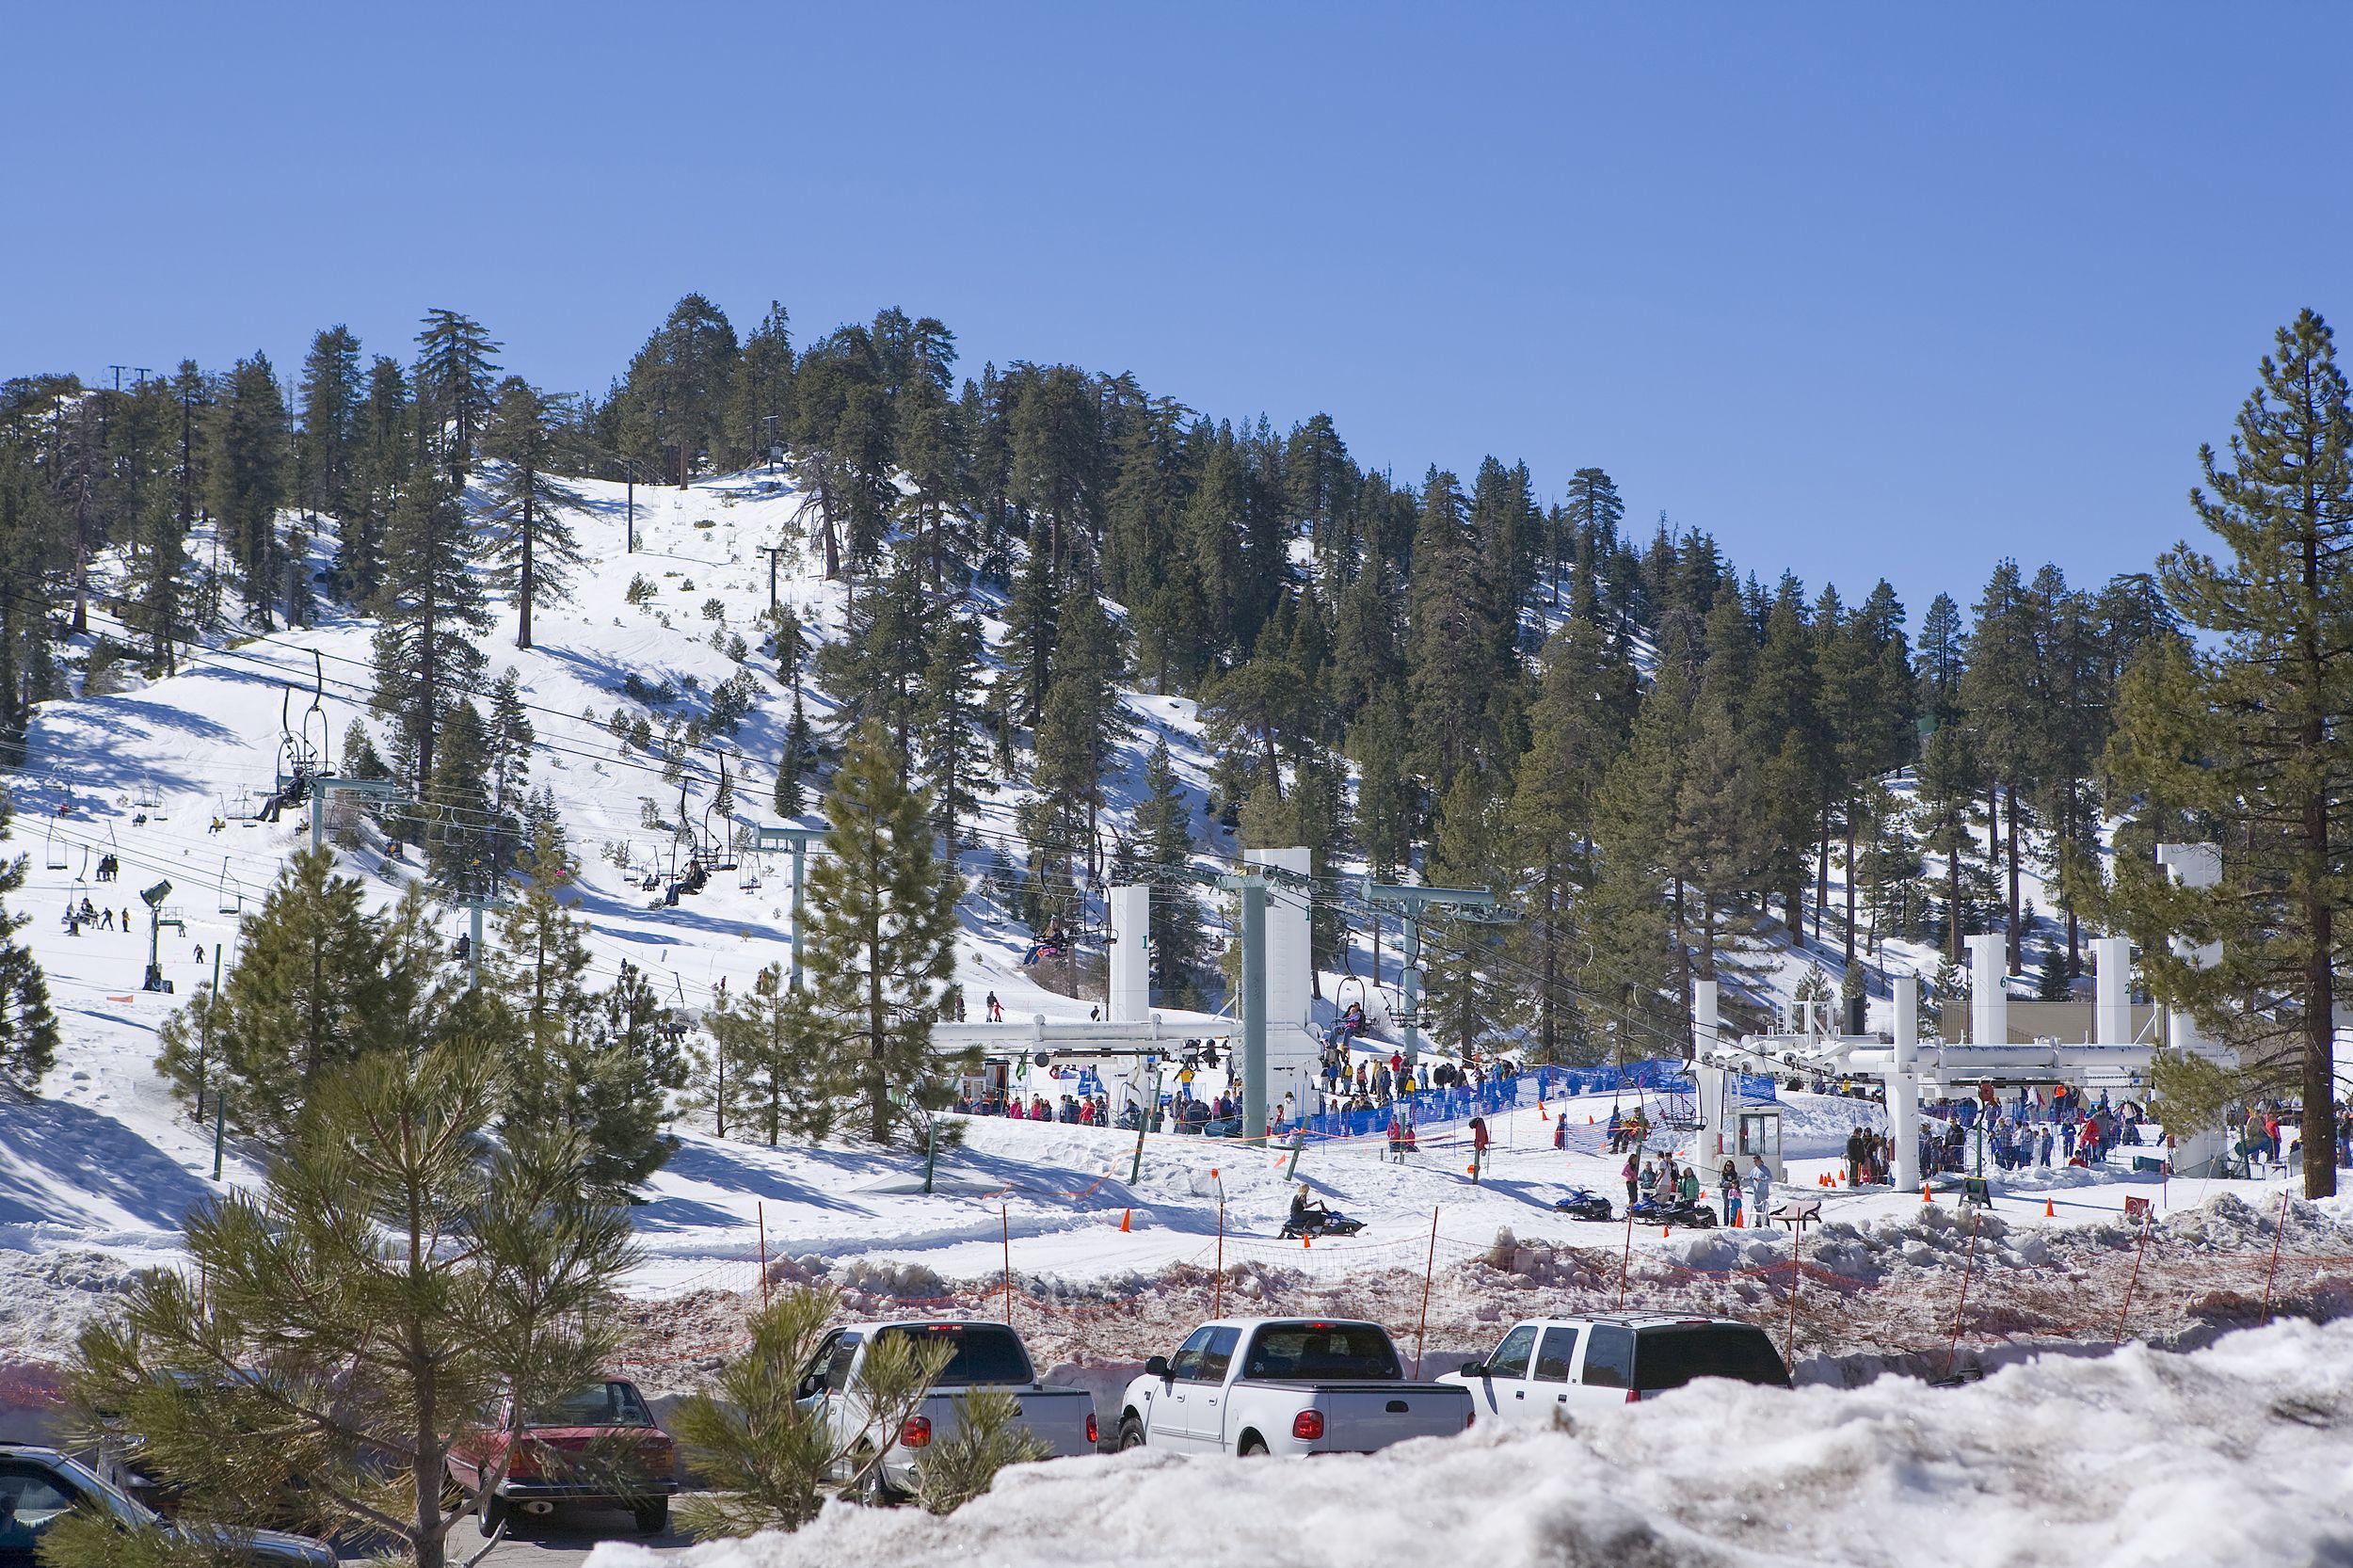 big bear ski resort with sunny sky during winter skiing winter rh pinterest com